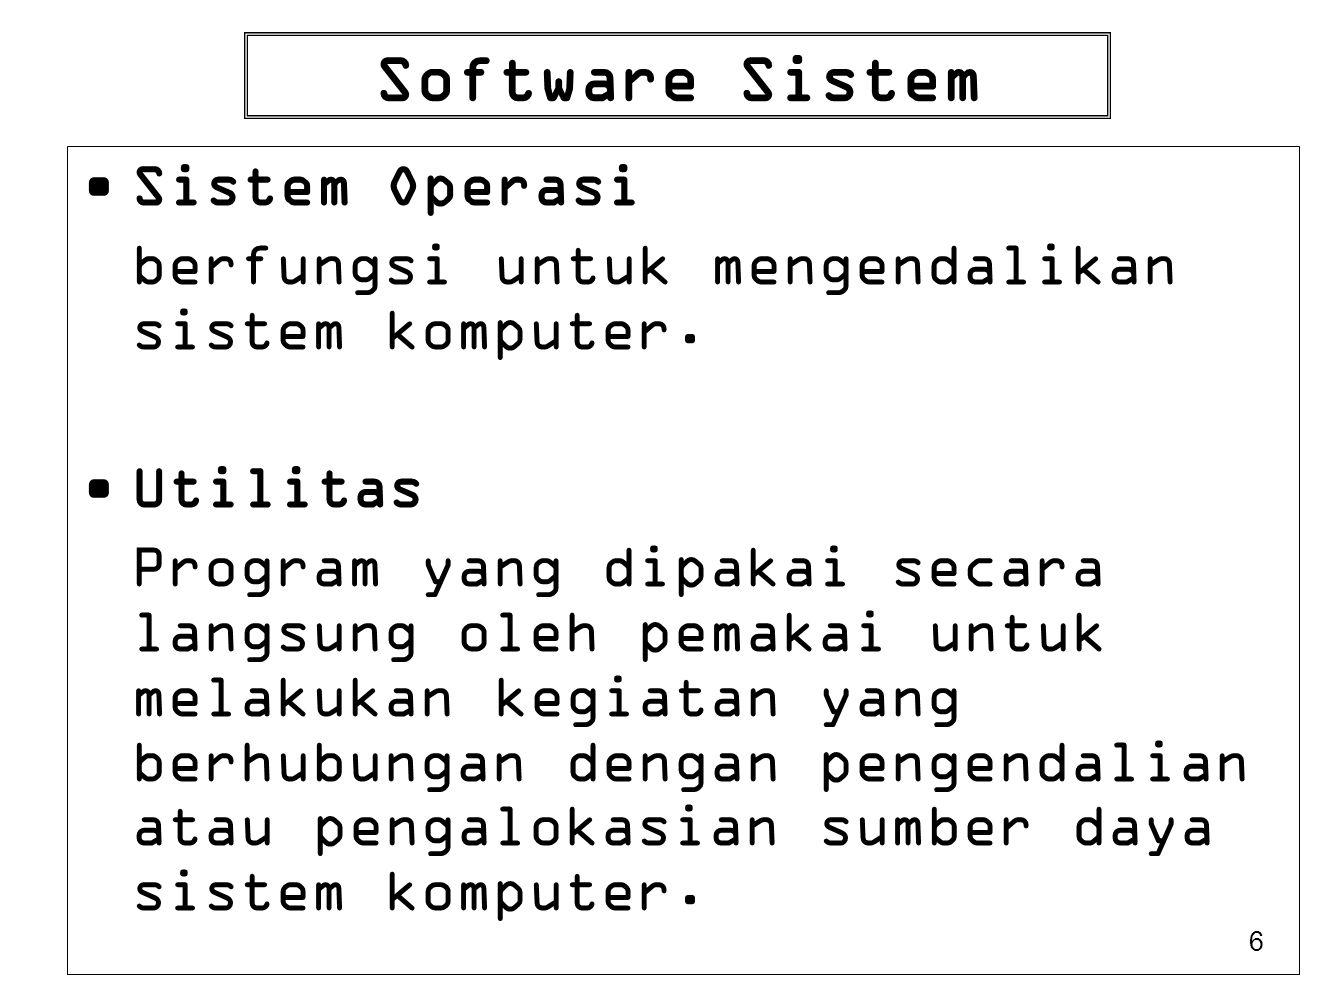 7 Device Driver Program yang digunakan untuk membantu komputer dalam mengendalikan piranti-piranti peripheral.